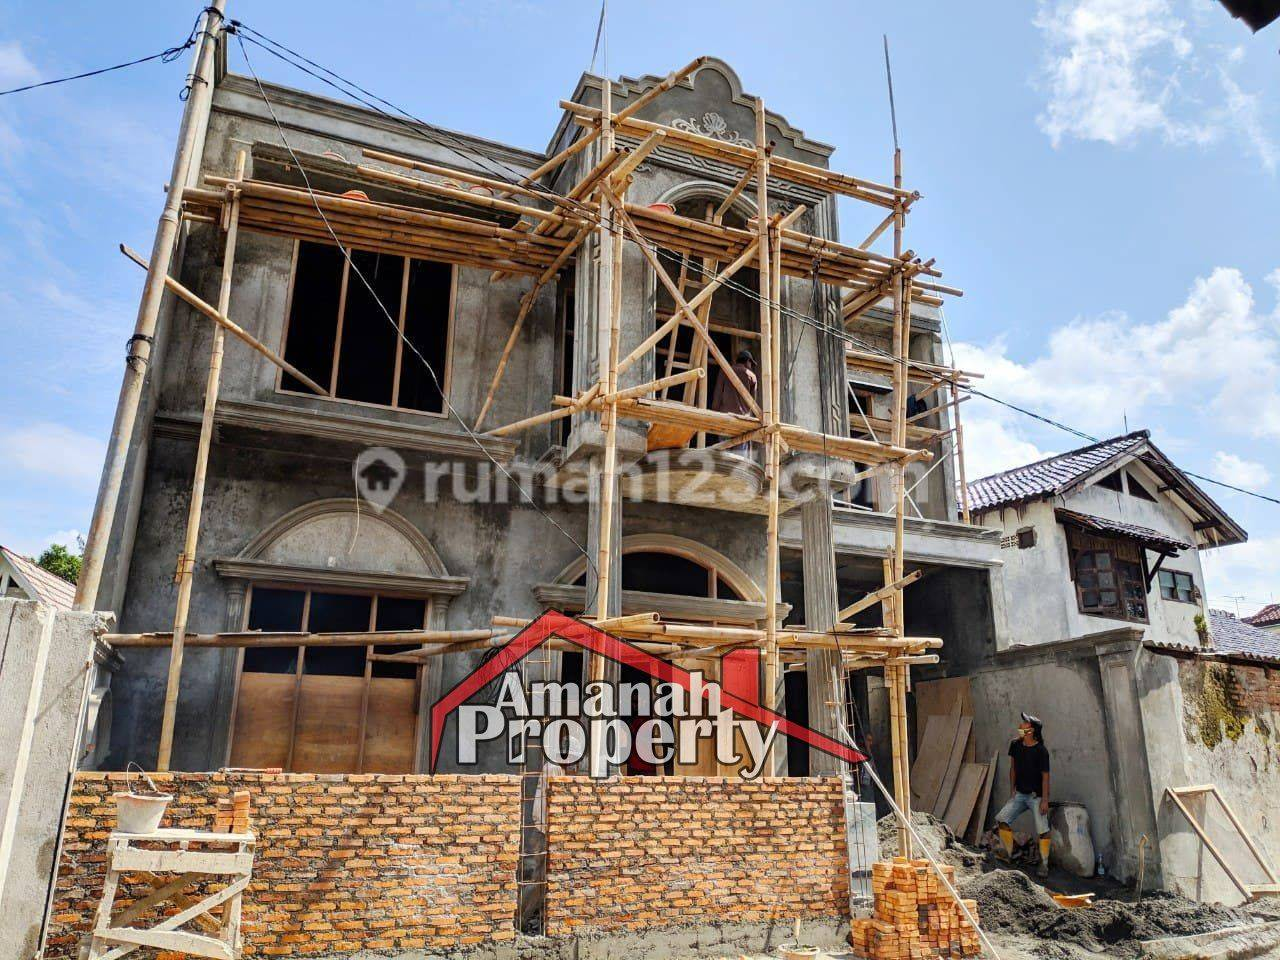 Rumah Mewah Lokasi Strategis Dekat Ragunan Cilandak Jagakarsa Ciganjur Jakarta Selatan